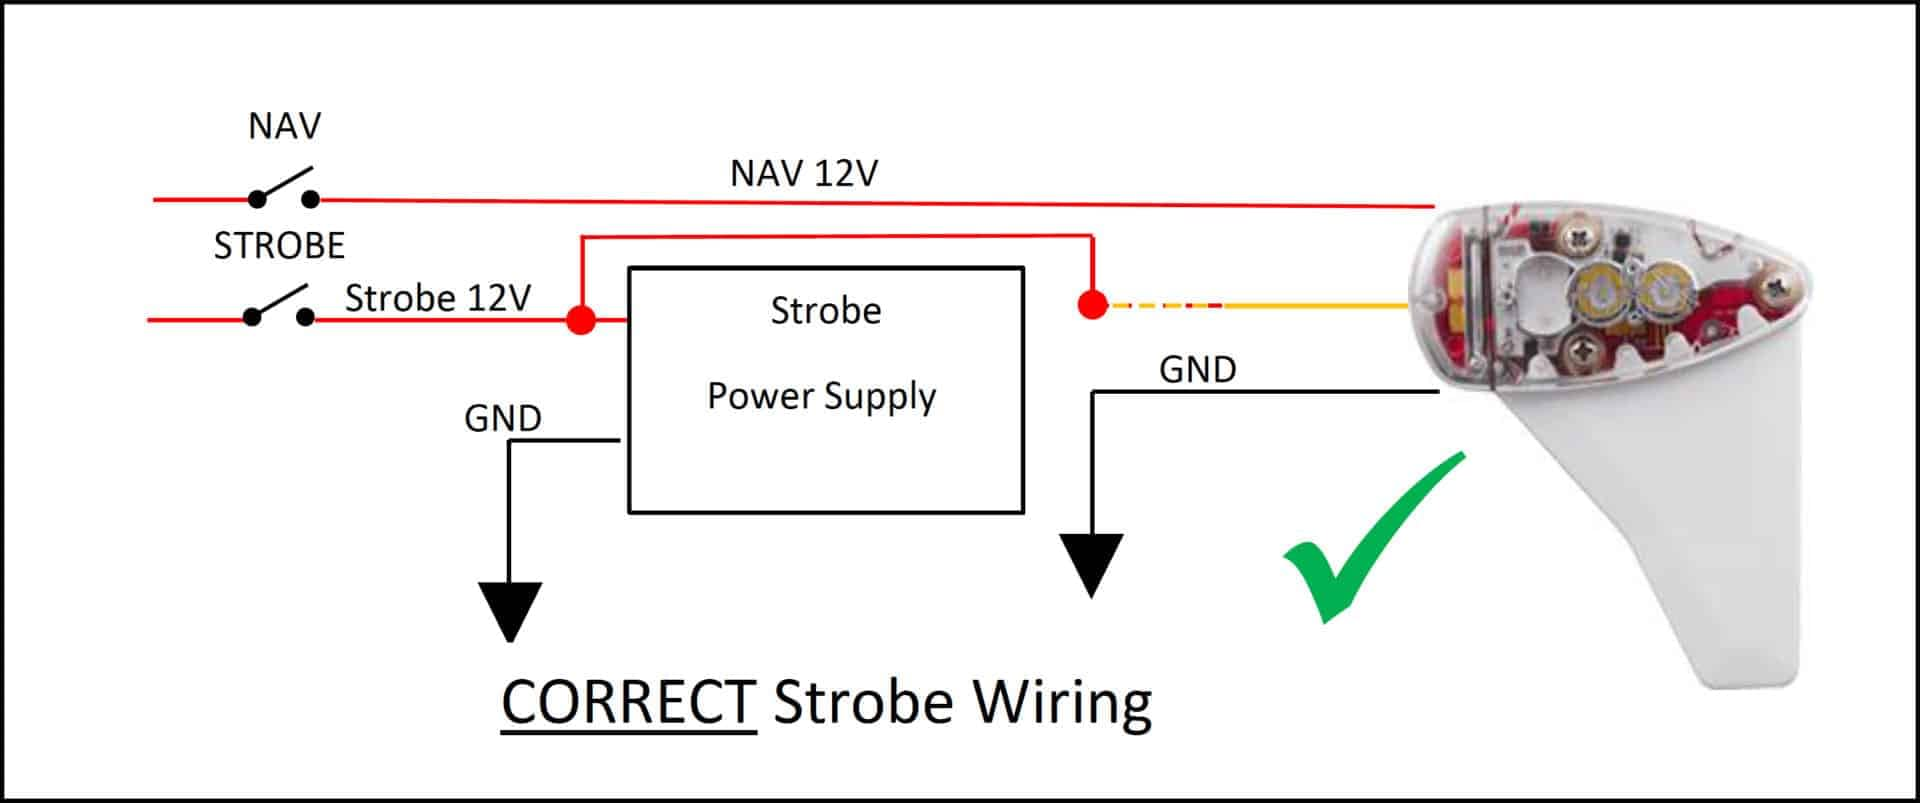 Strobe Wiring Diagram - uAvionix